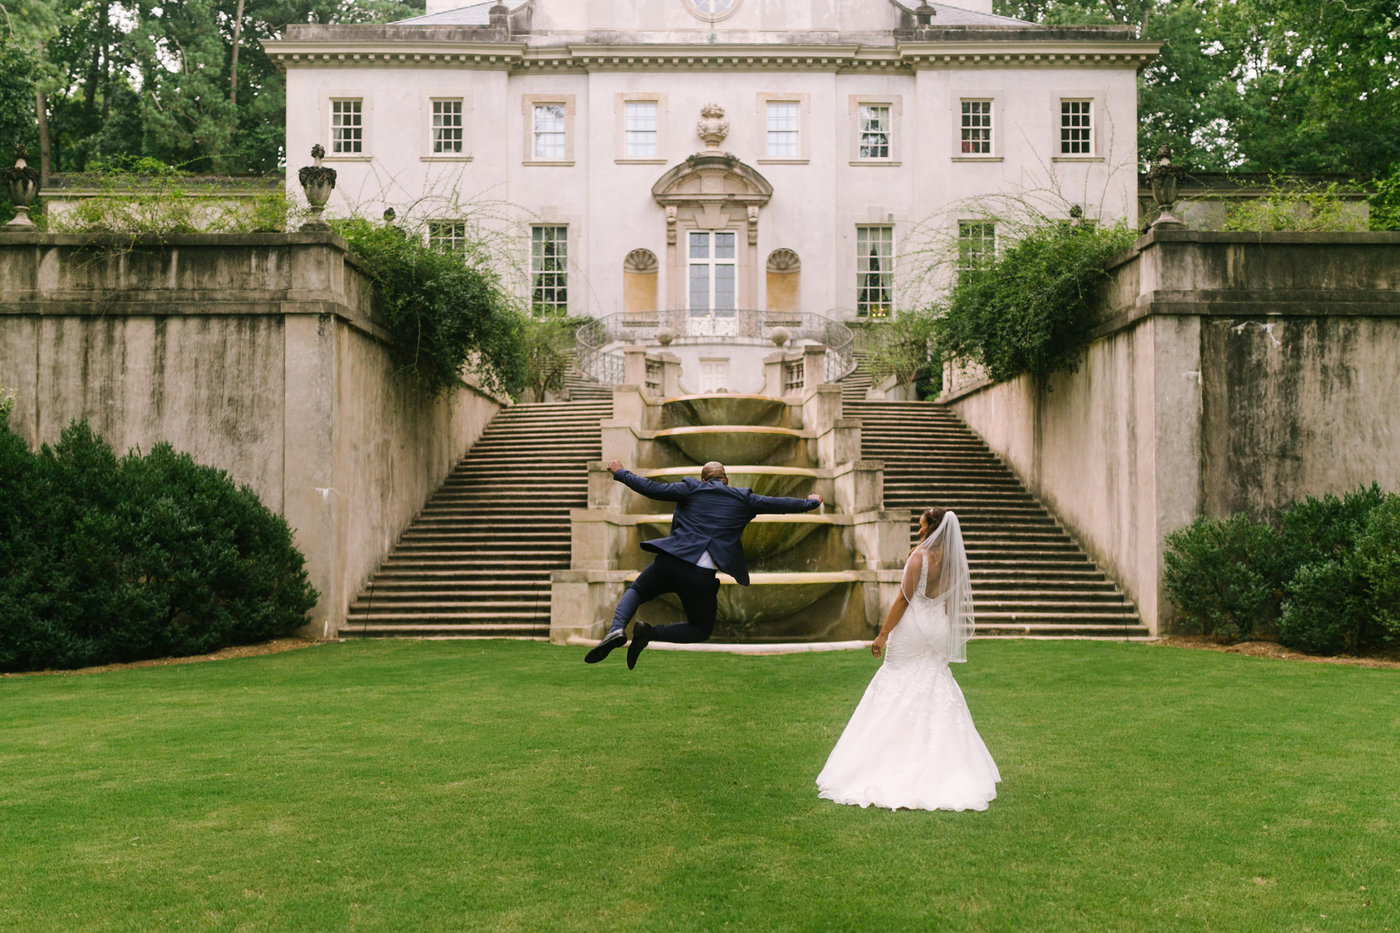 swan-house-atlanta-history-center-wedding.jpg